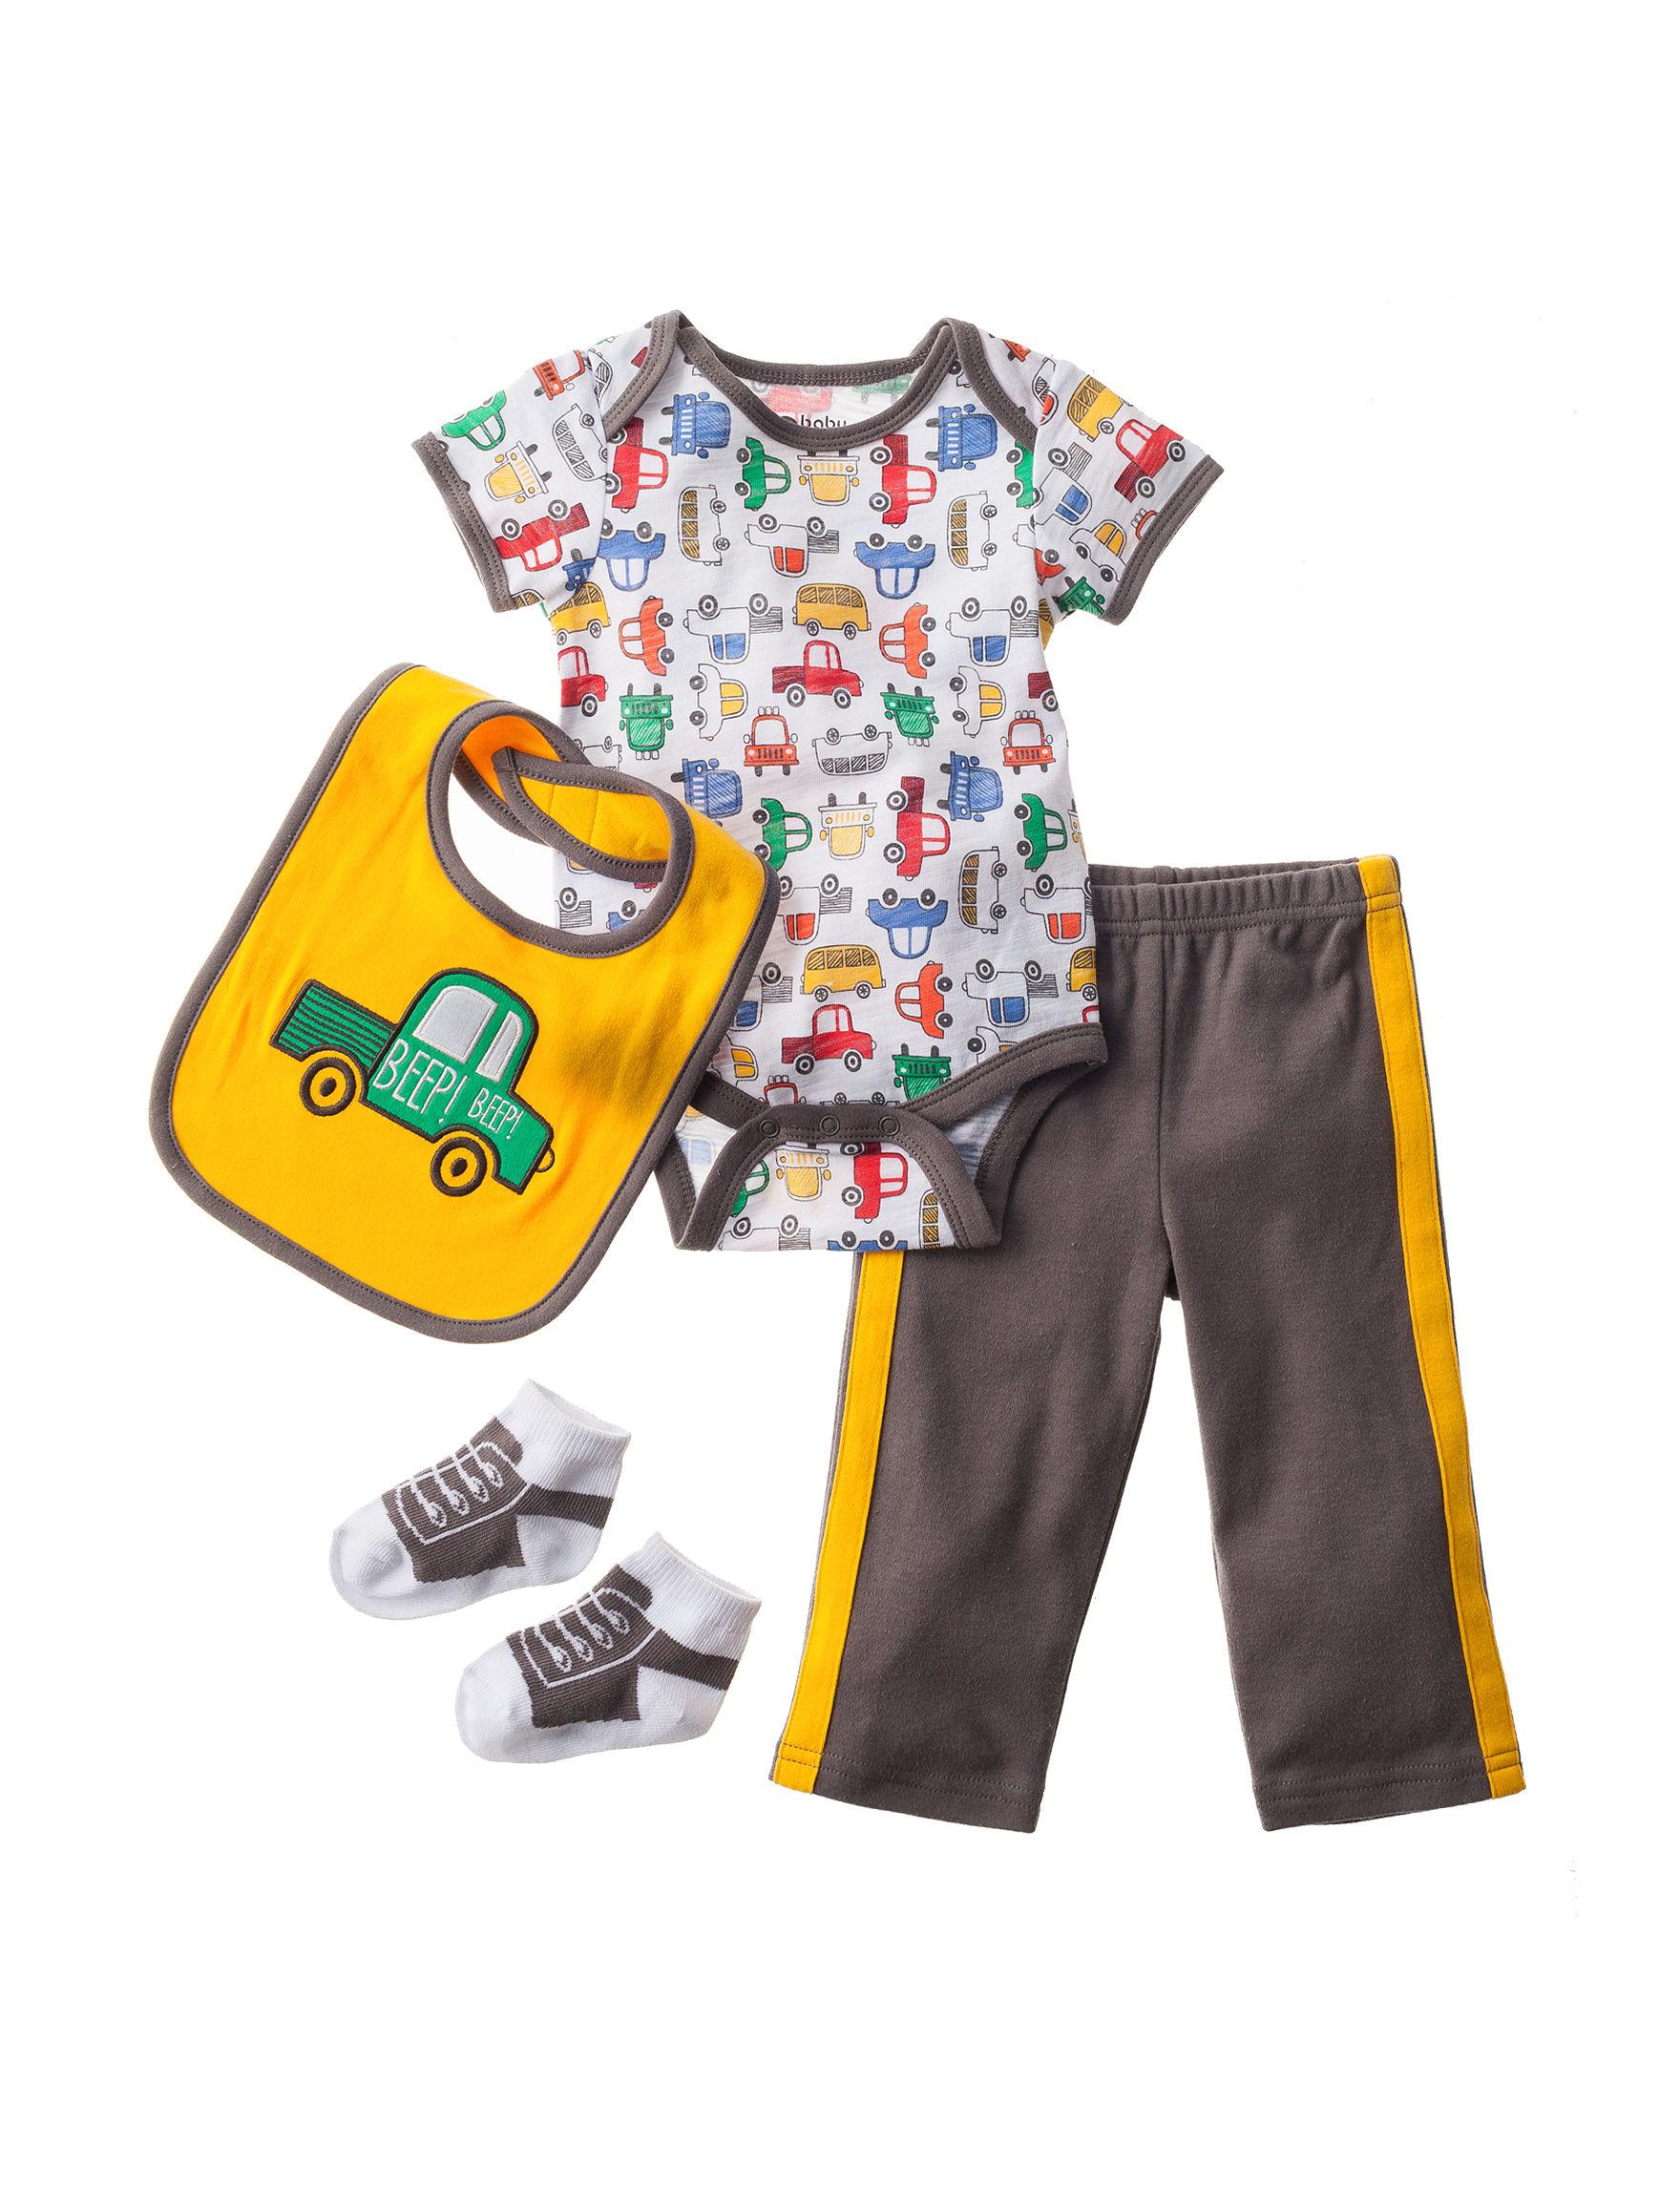 Baby Gear Yellow